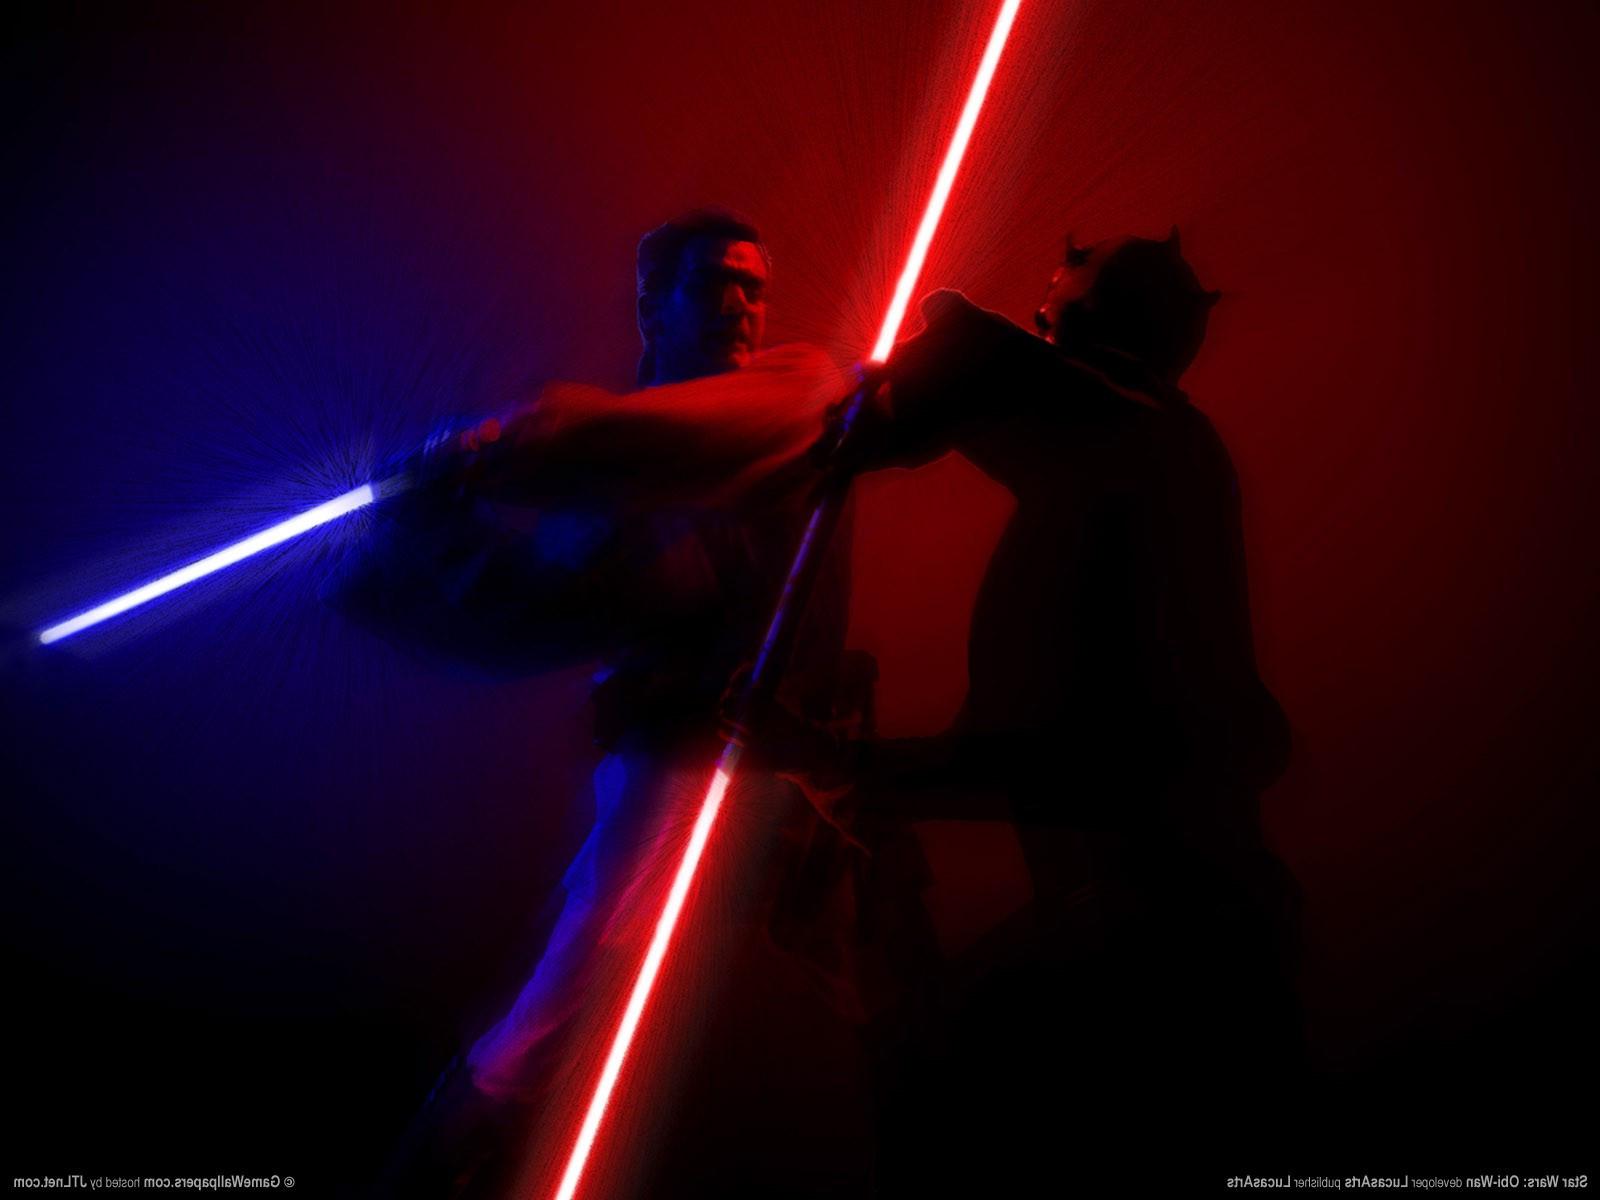 Wallpaper Star Wars Night Science Fiction Lightsaber Obi Wan